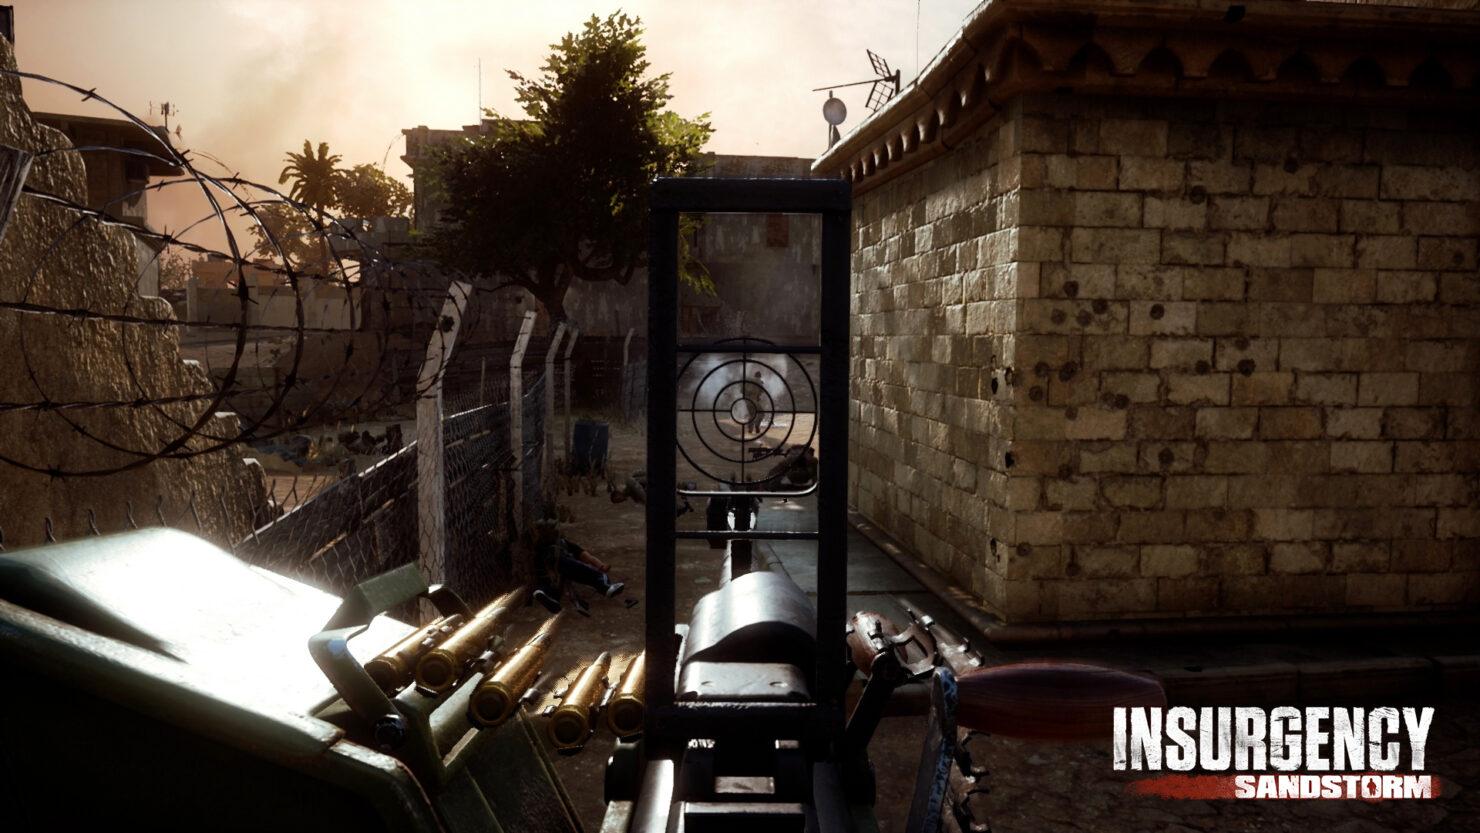 insurgency_sandstorm-screenshot-08-new_logo